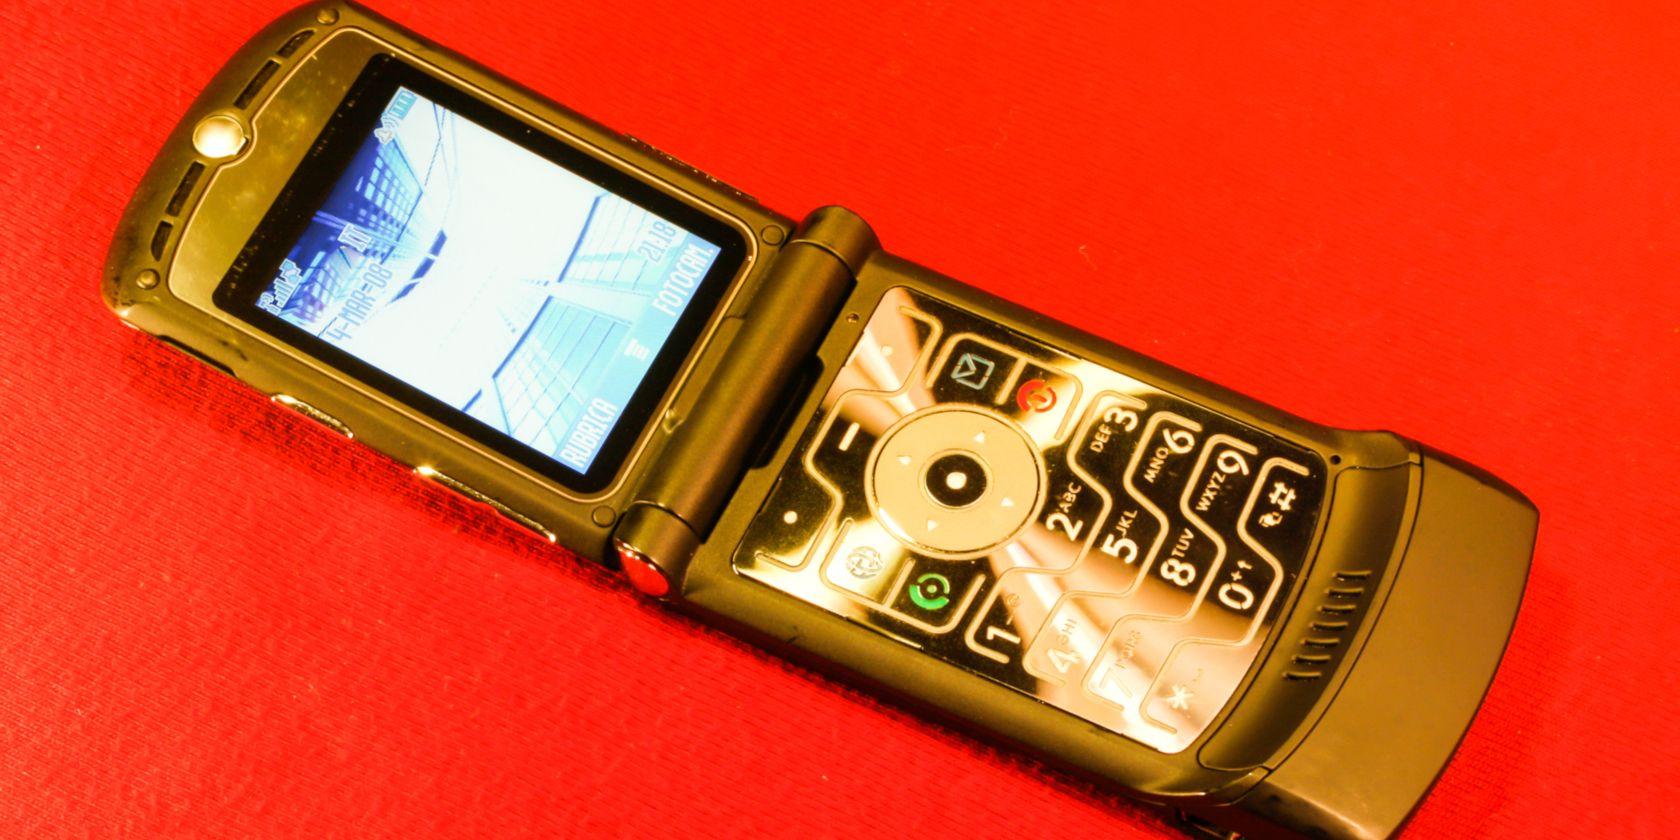 Motorola's Razr Is Coming Back as a HighEnd, 1500